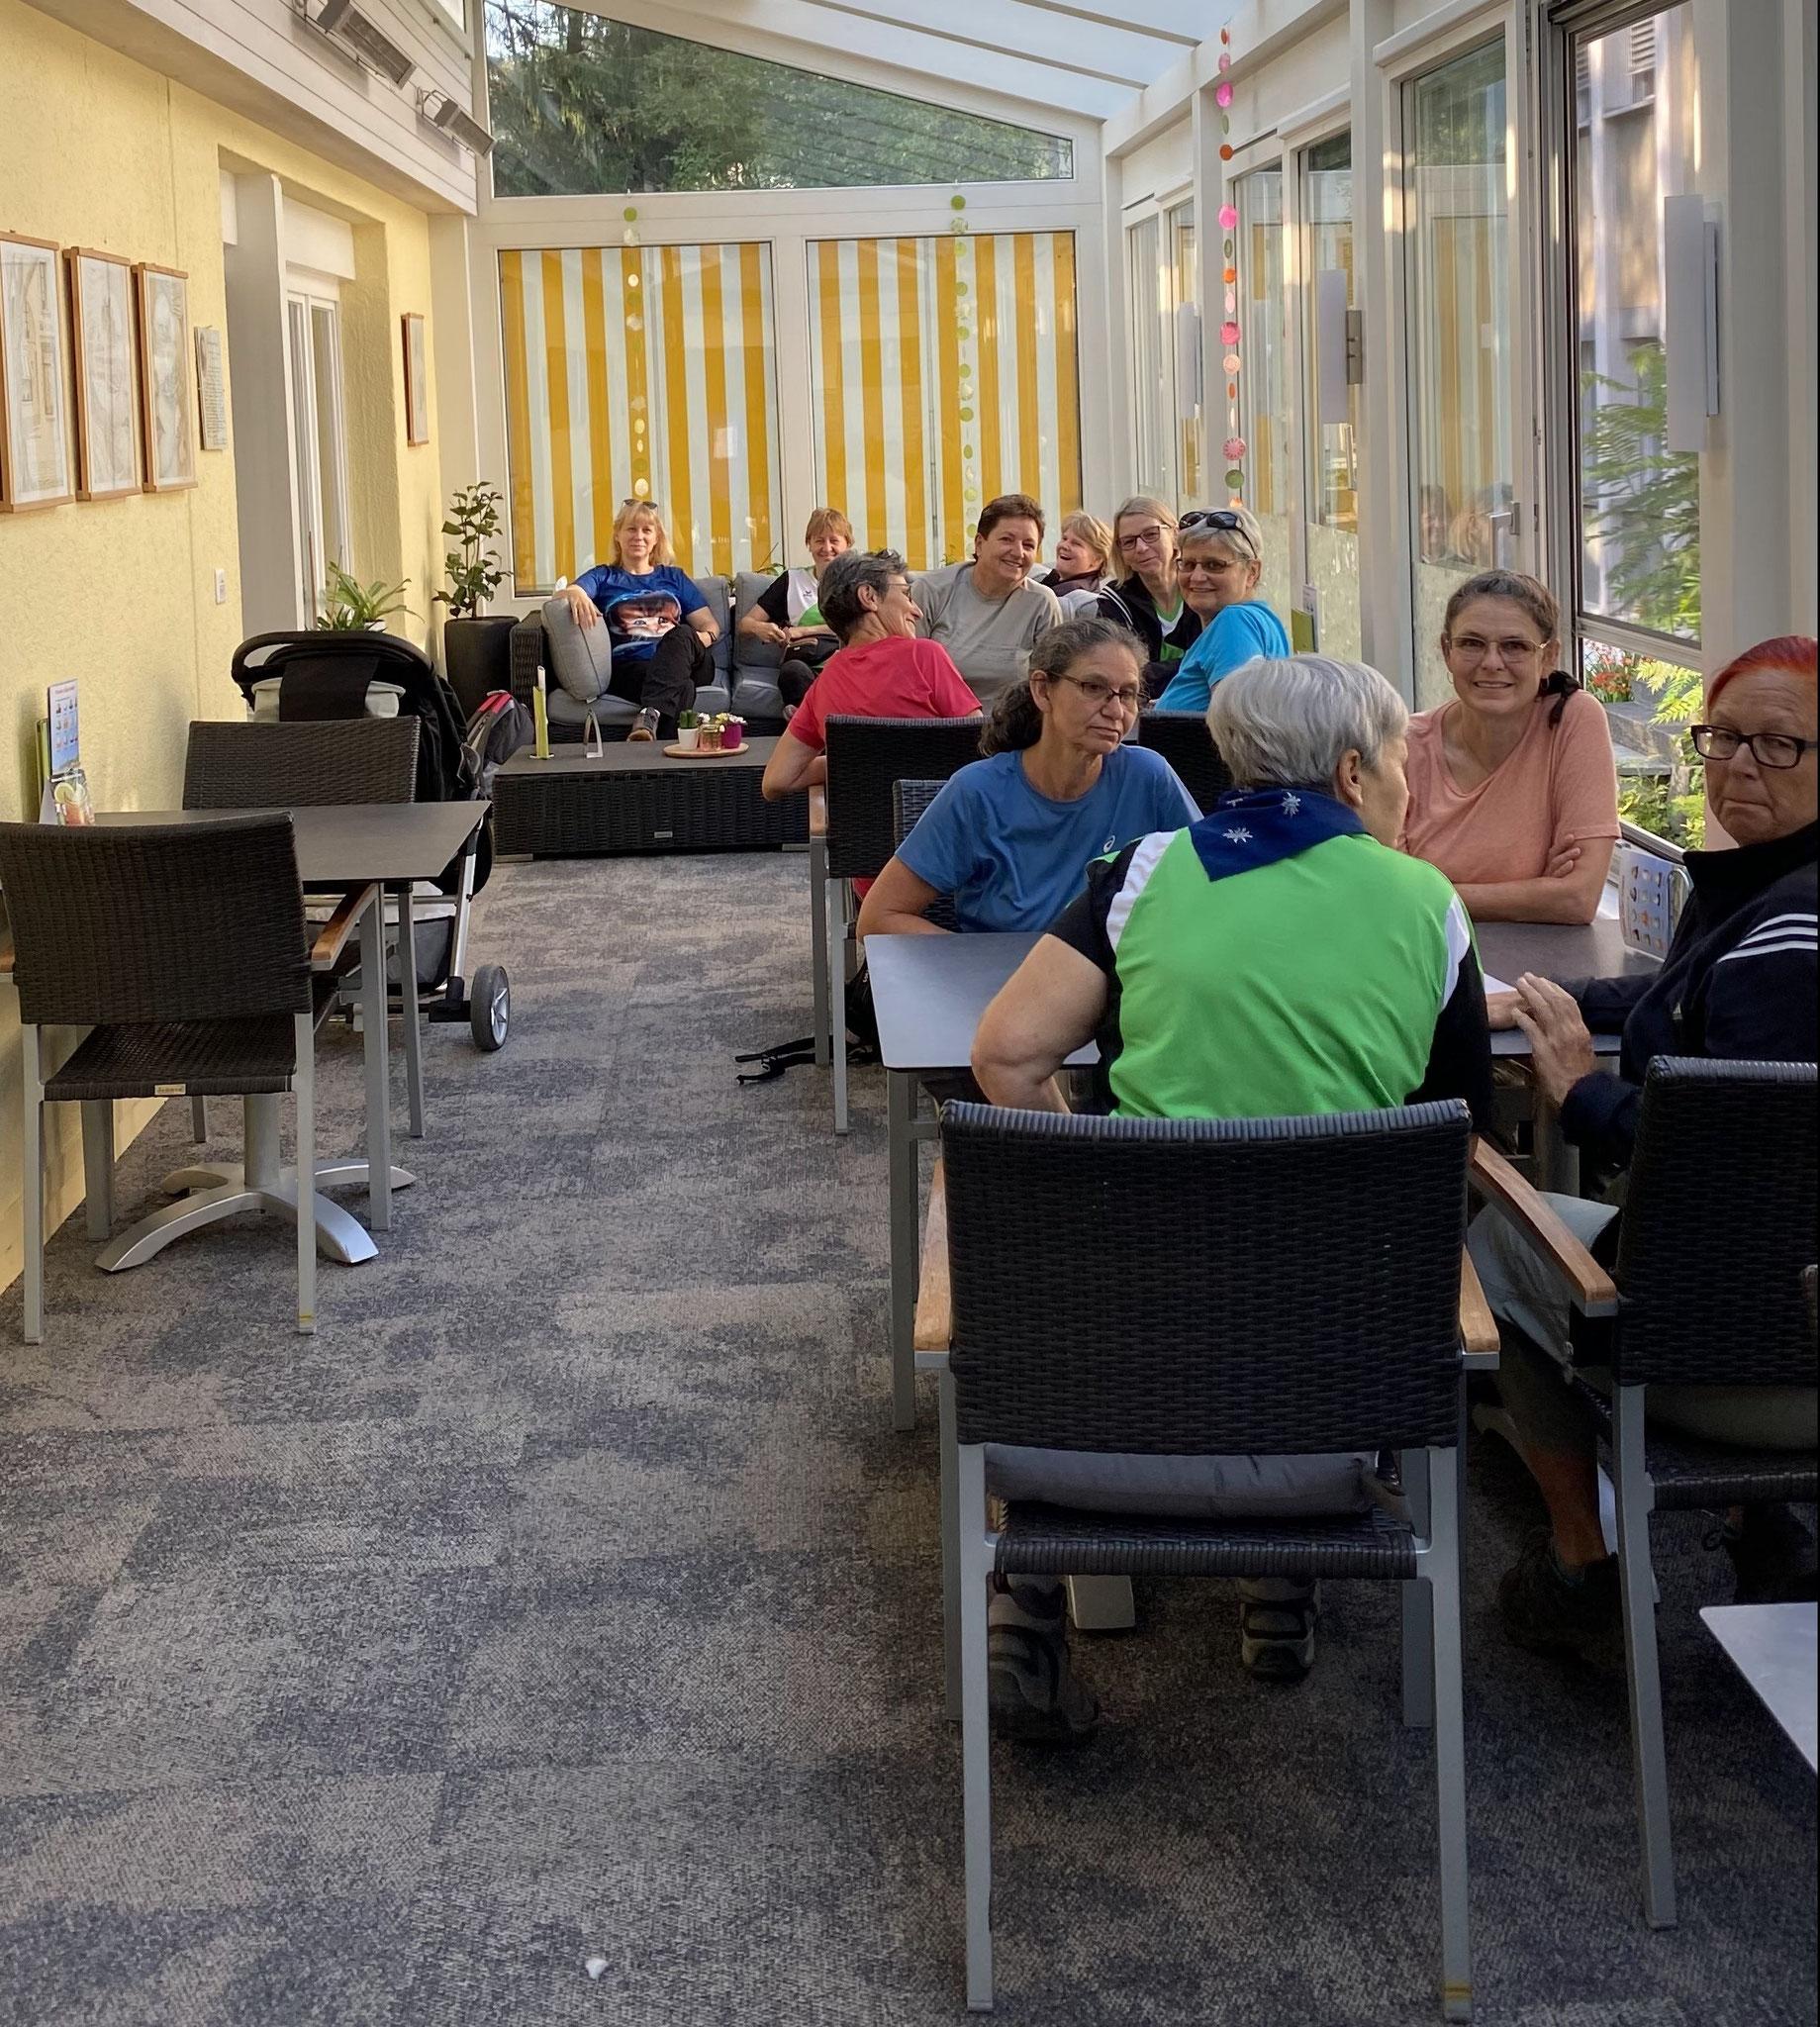 Kaffeepause im Café Brändle in Unterägeri ZG